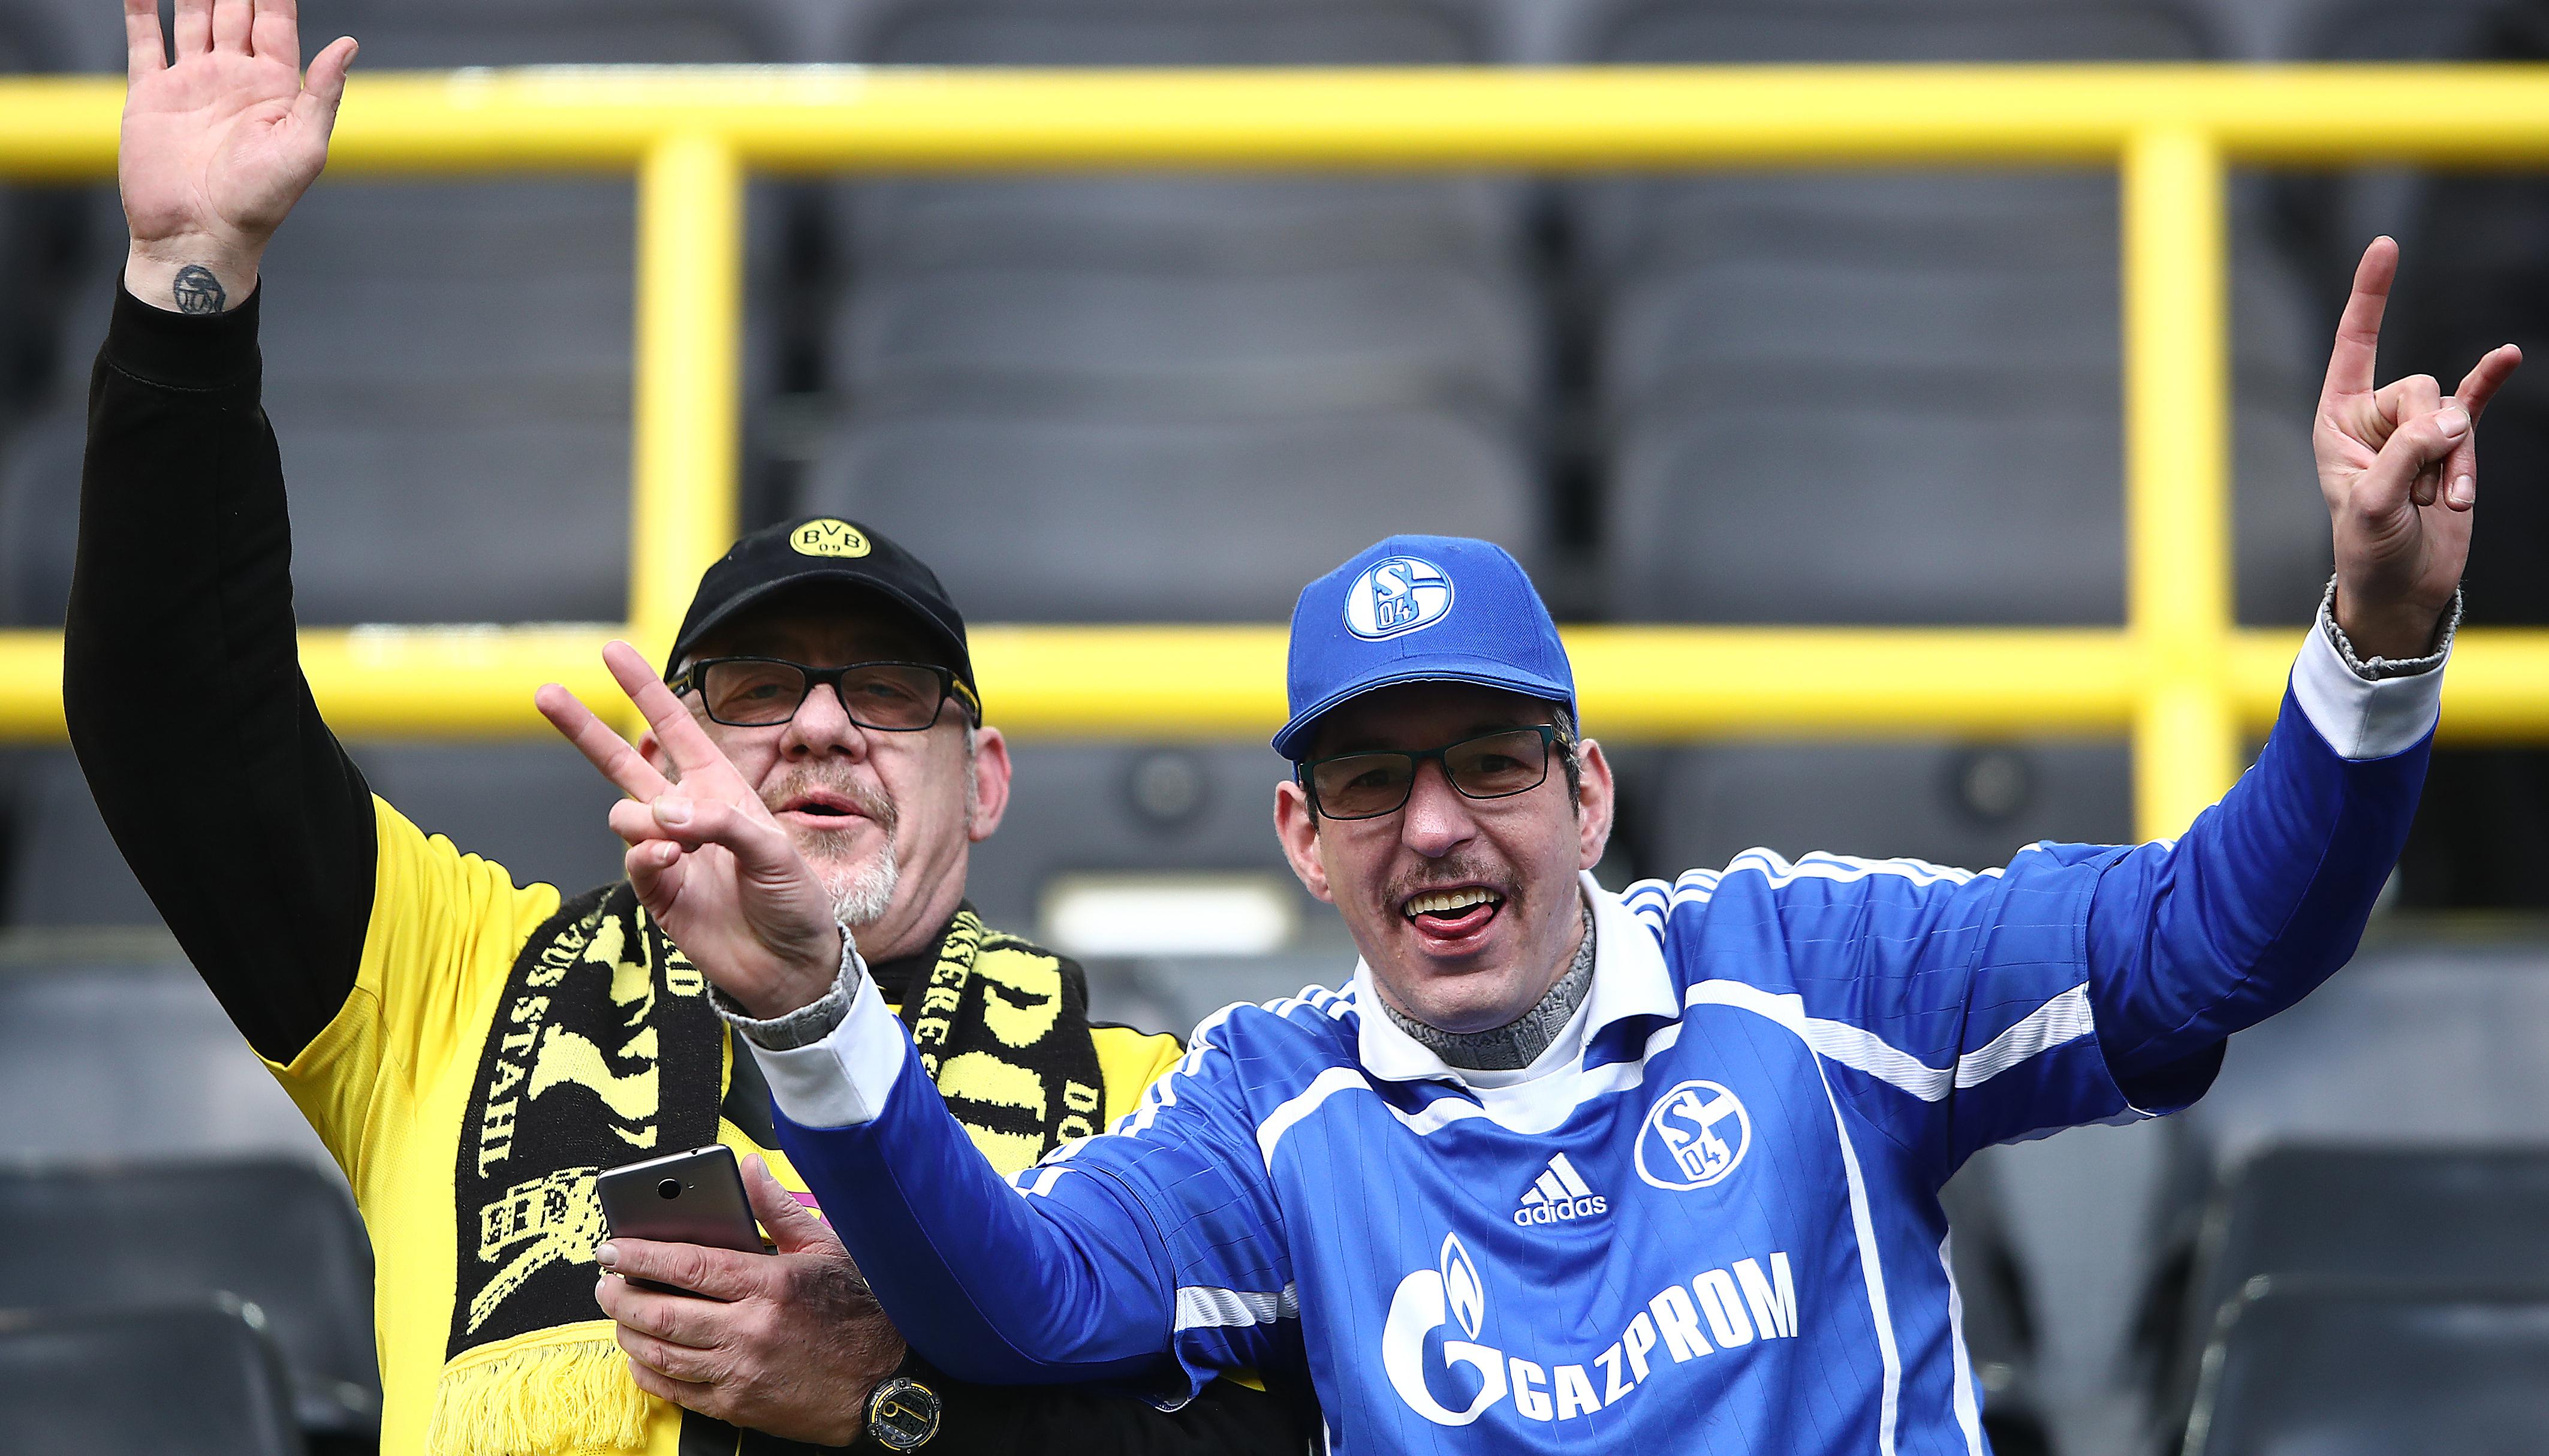 Bundesliga: Meister im Pott gesucht